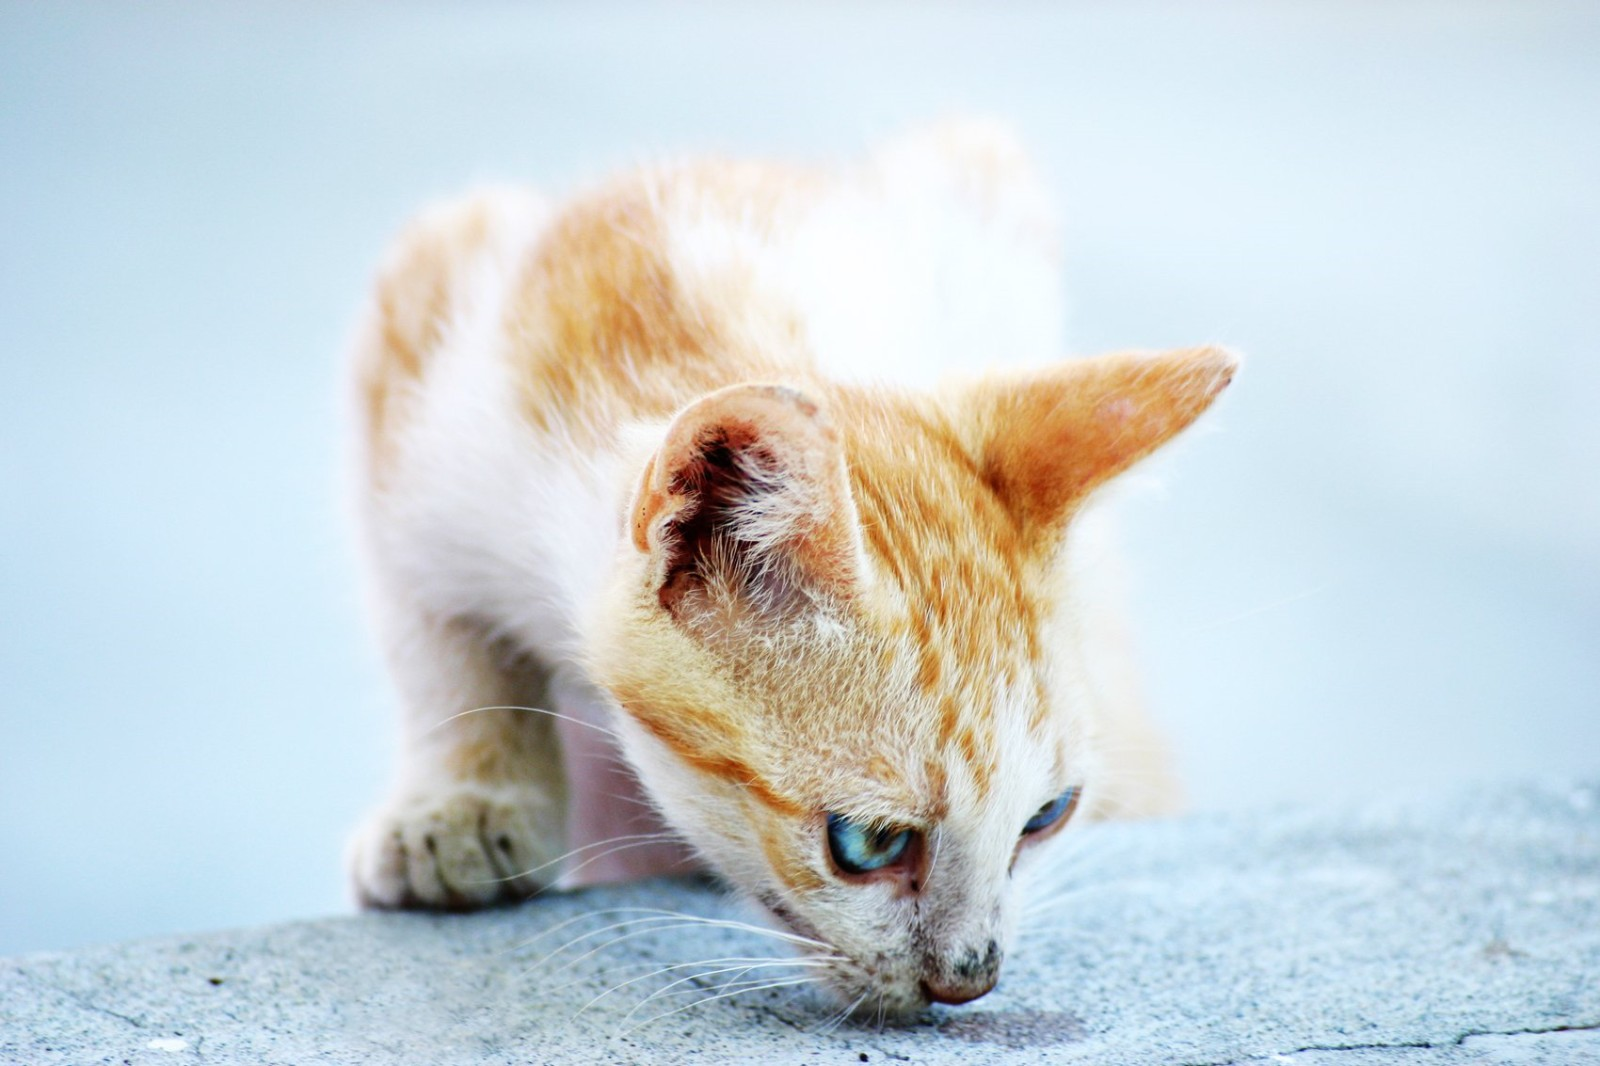 Проблема запаха кошачьей мочи